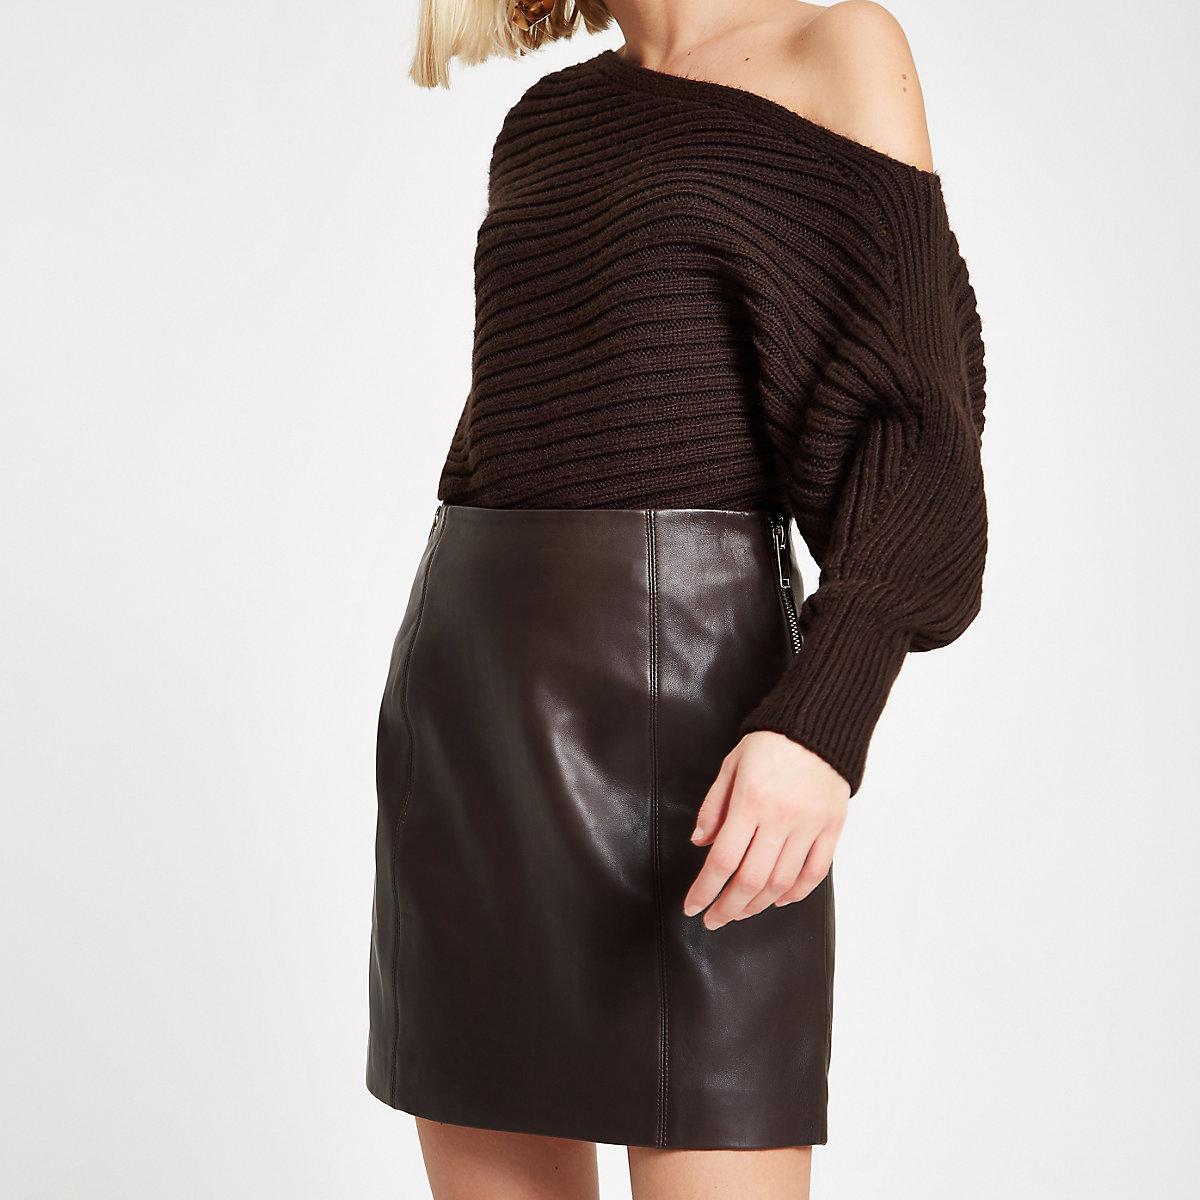 Dark brown leather side zip mini skirt